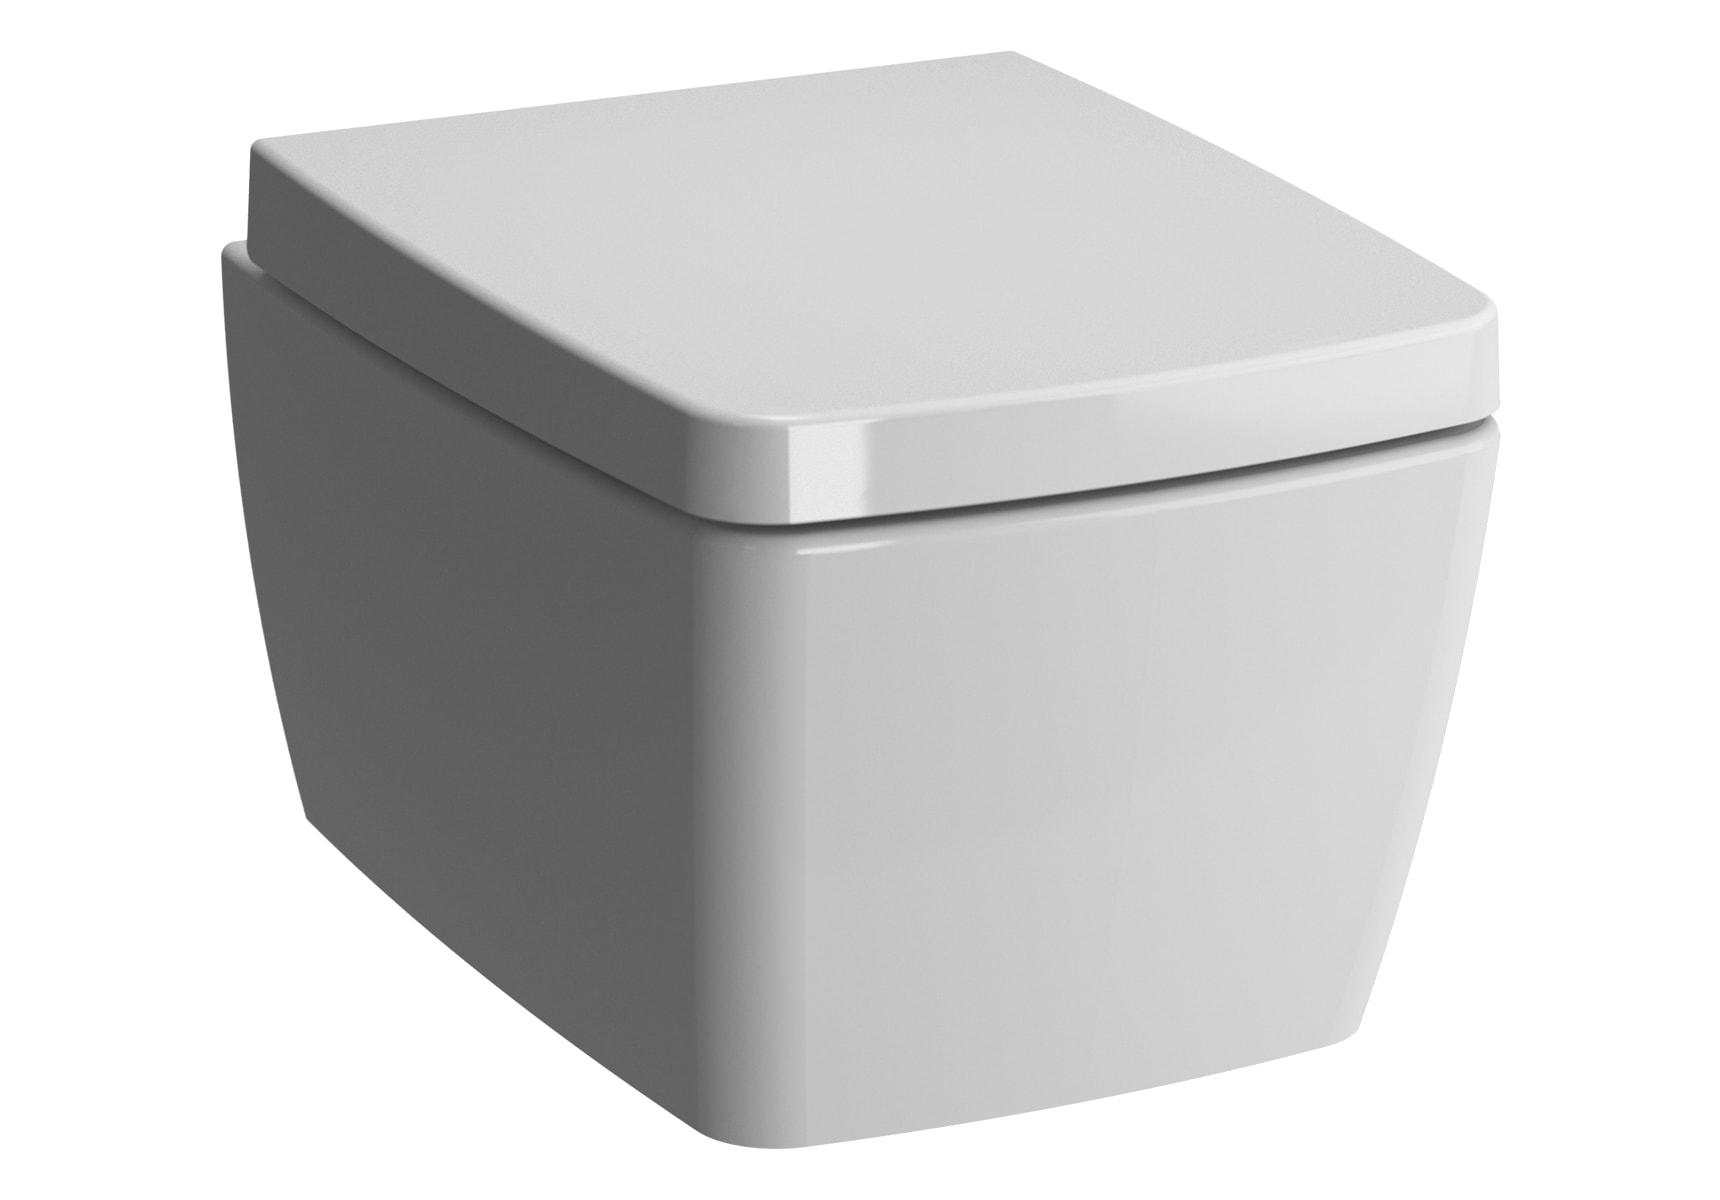 Metropole Wall-Hung WC Pan, 48 cm